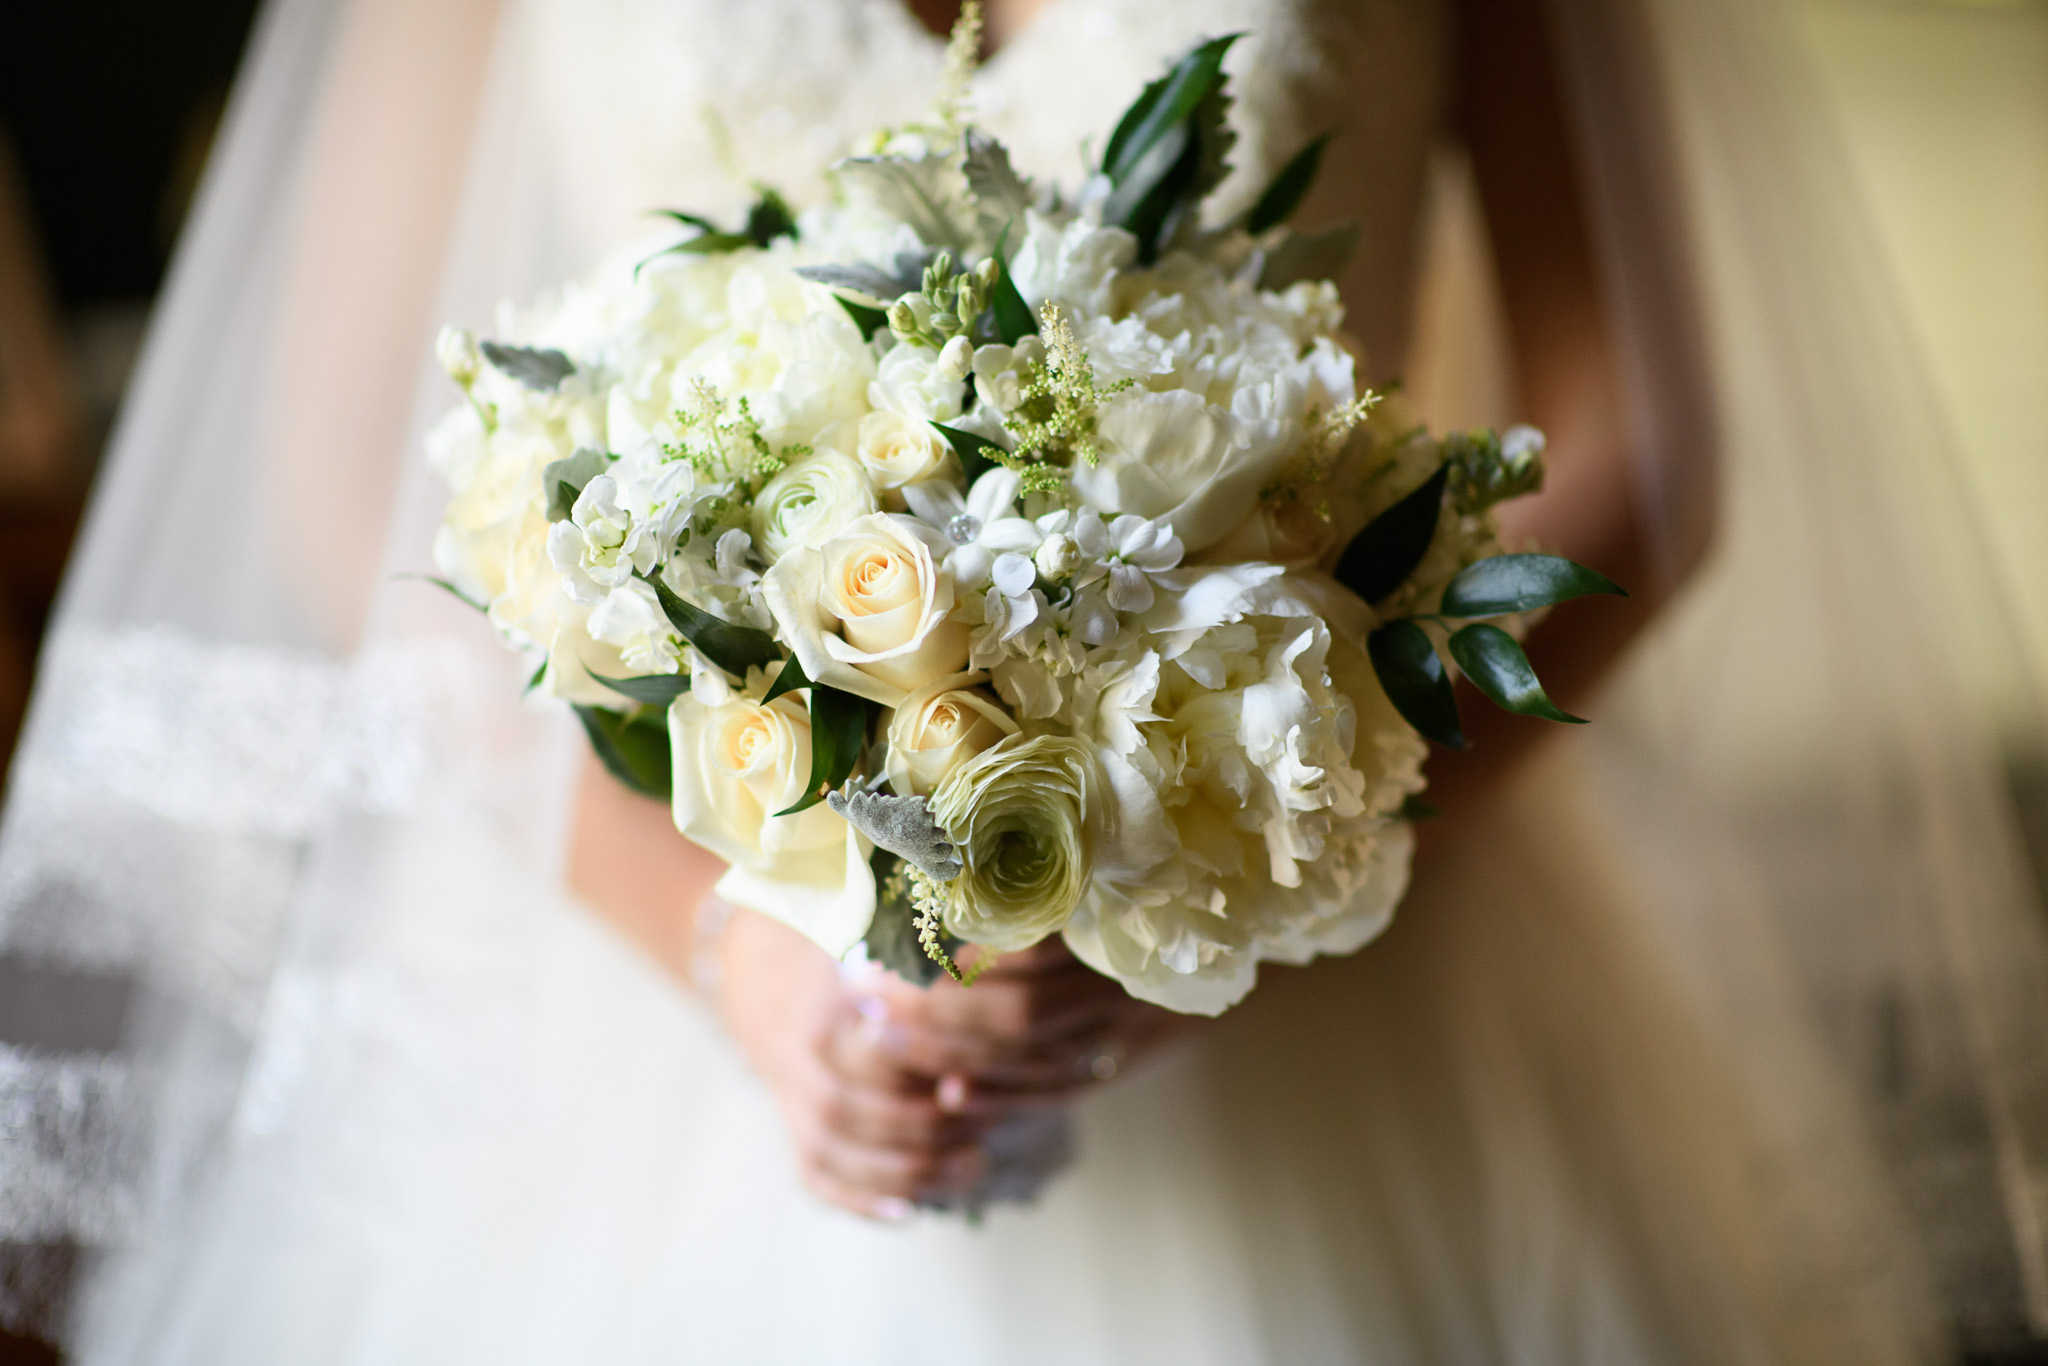 Bride holding bouquet of wedding flowers | Lotus Wedding Photography